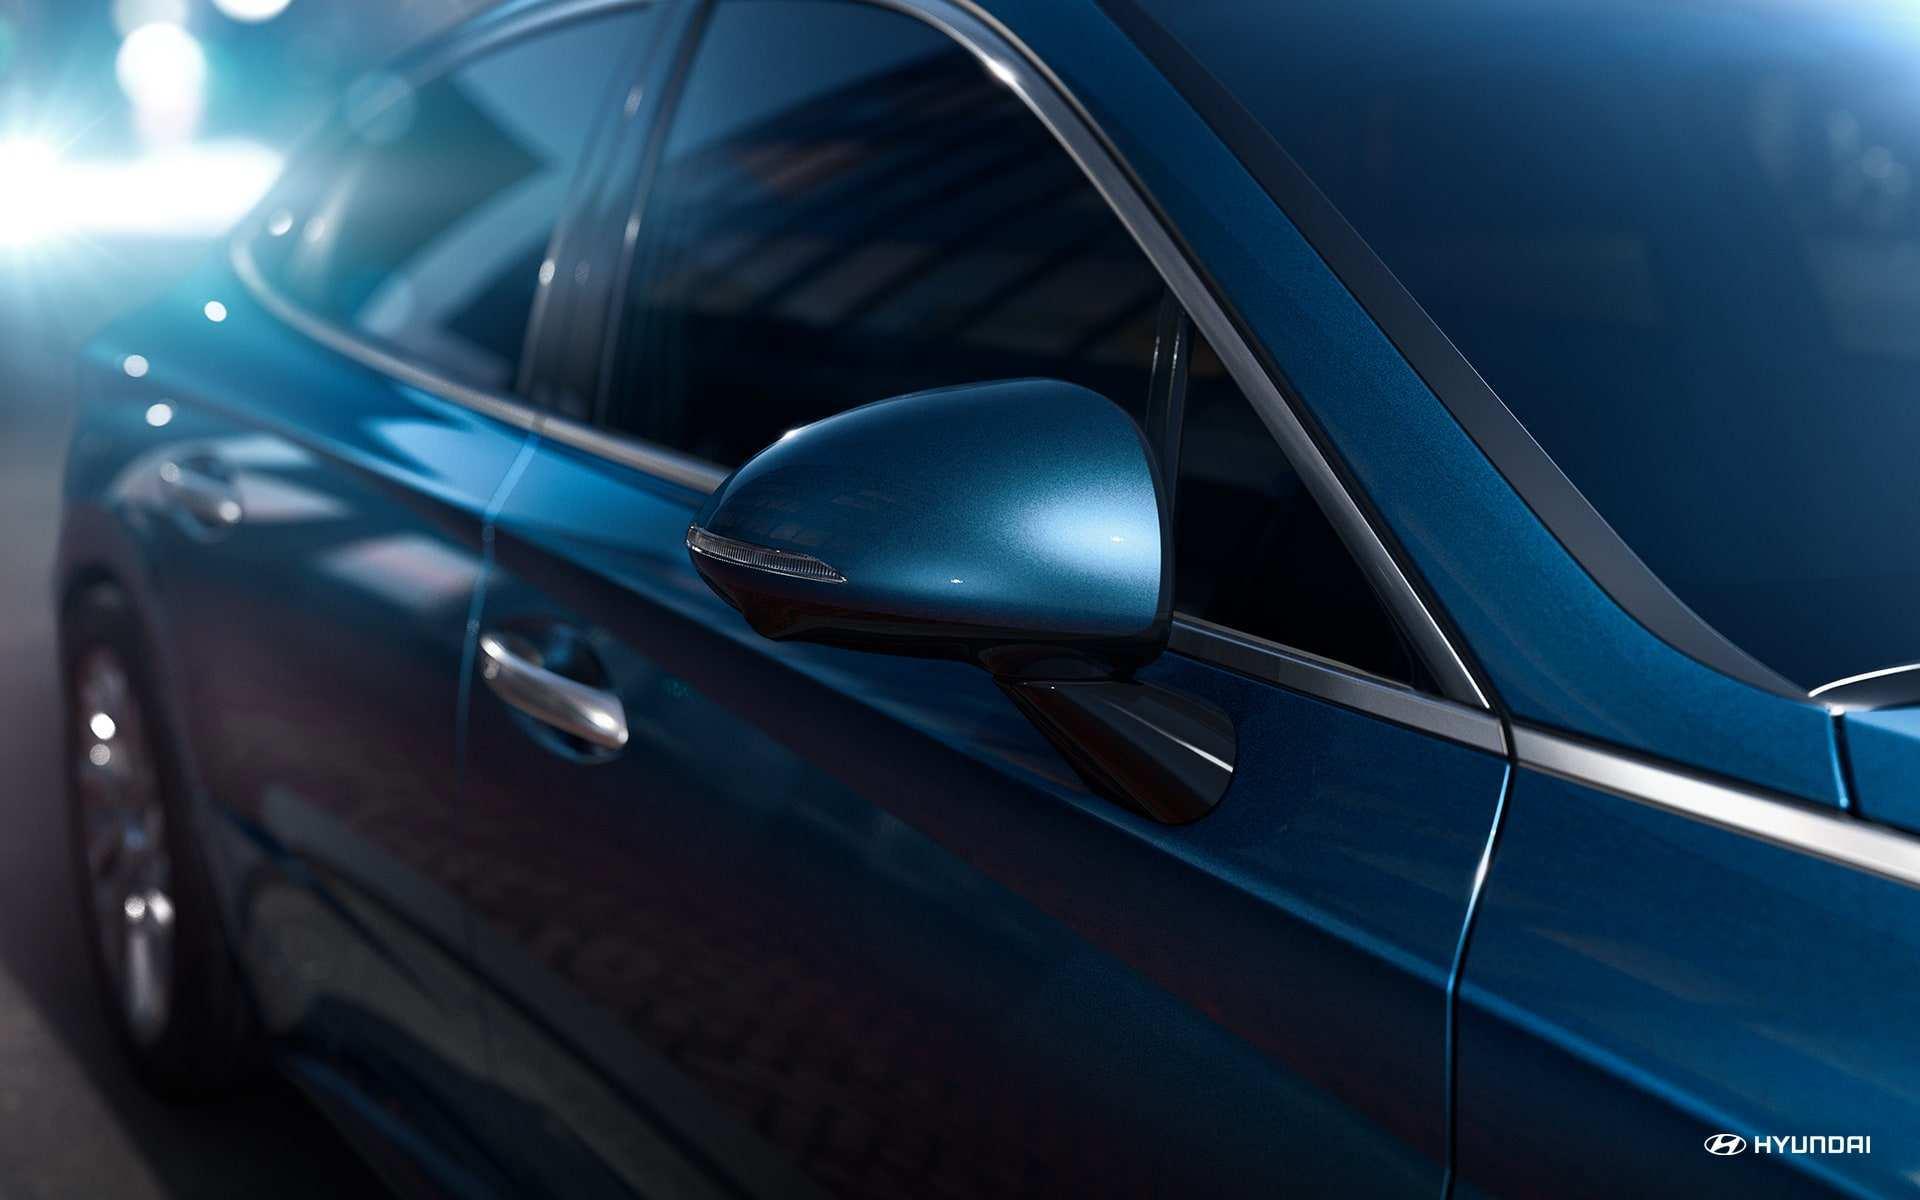 60 Concept of 2020 Hyundai Sonata Brochure Rumors with 2020 Hyundai Sonata Brochure